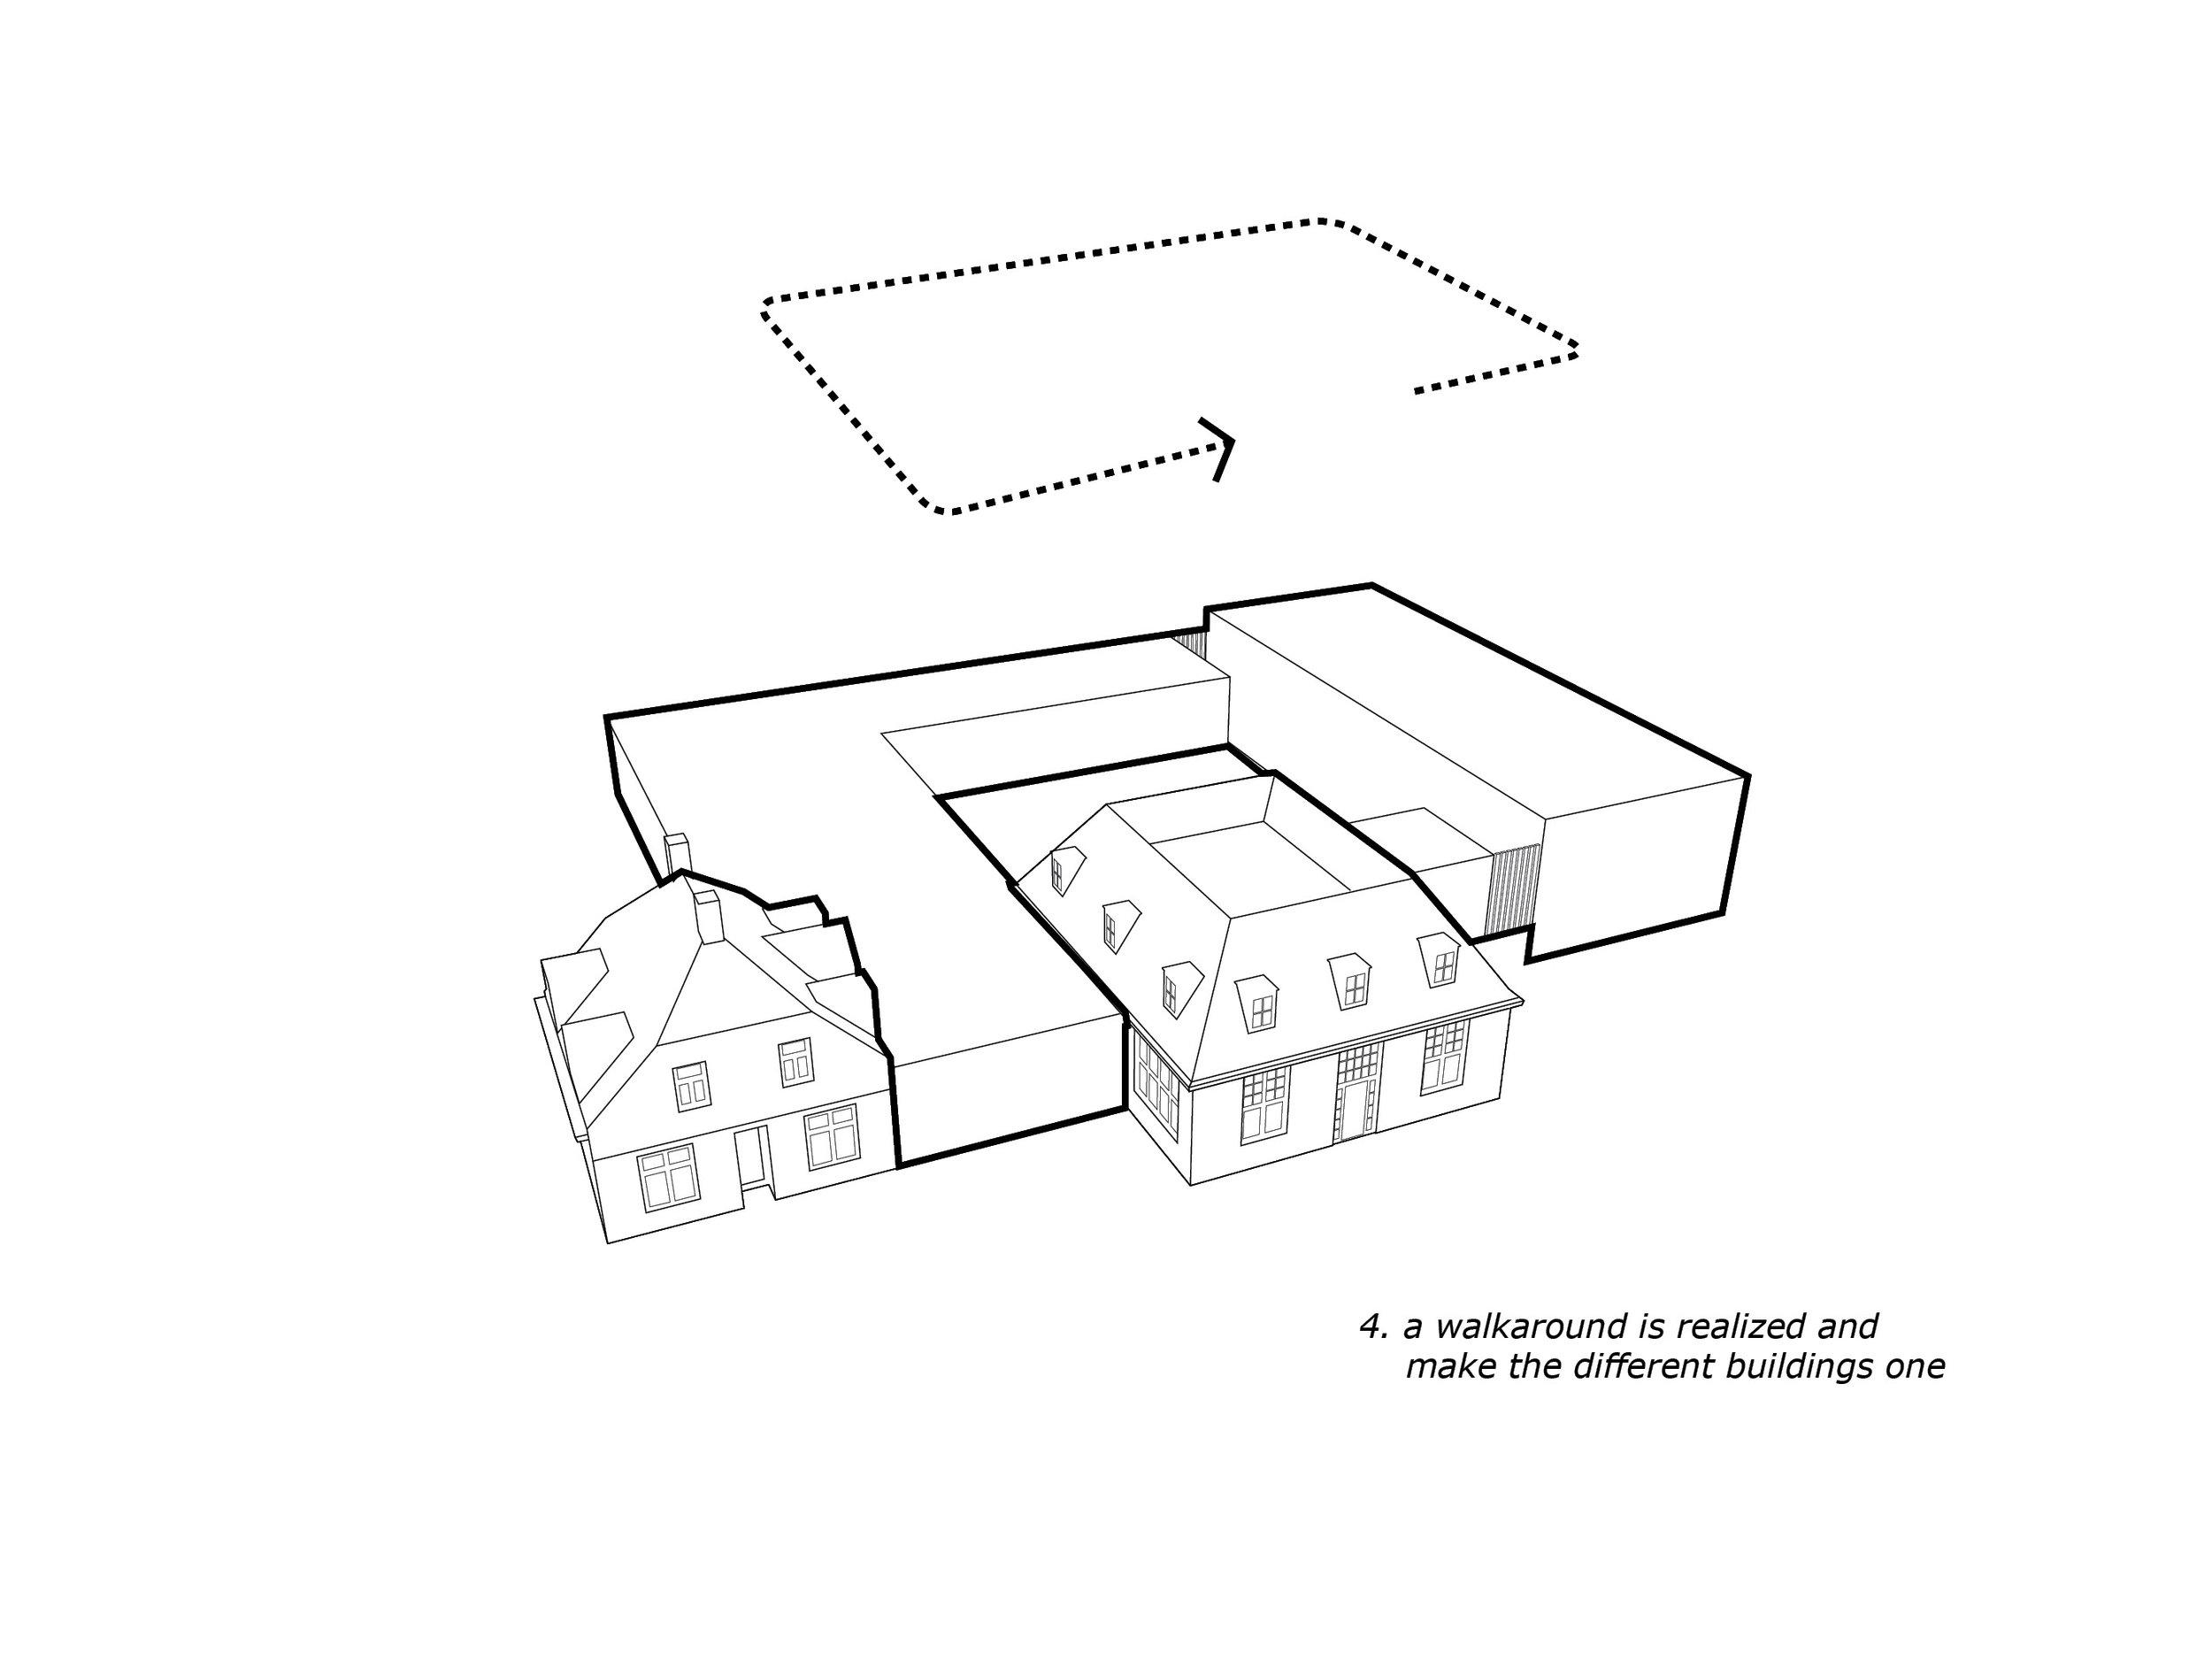 Personal-Architecture-soest-stayokay2-4.jpg